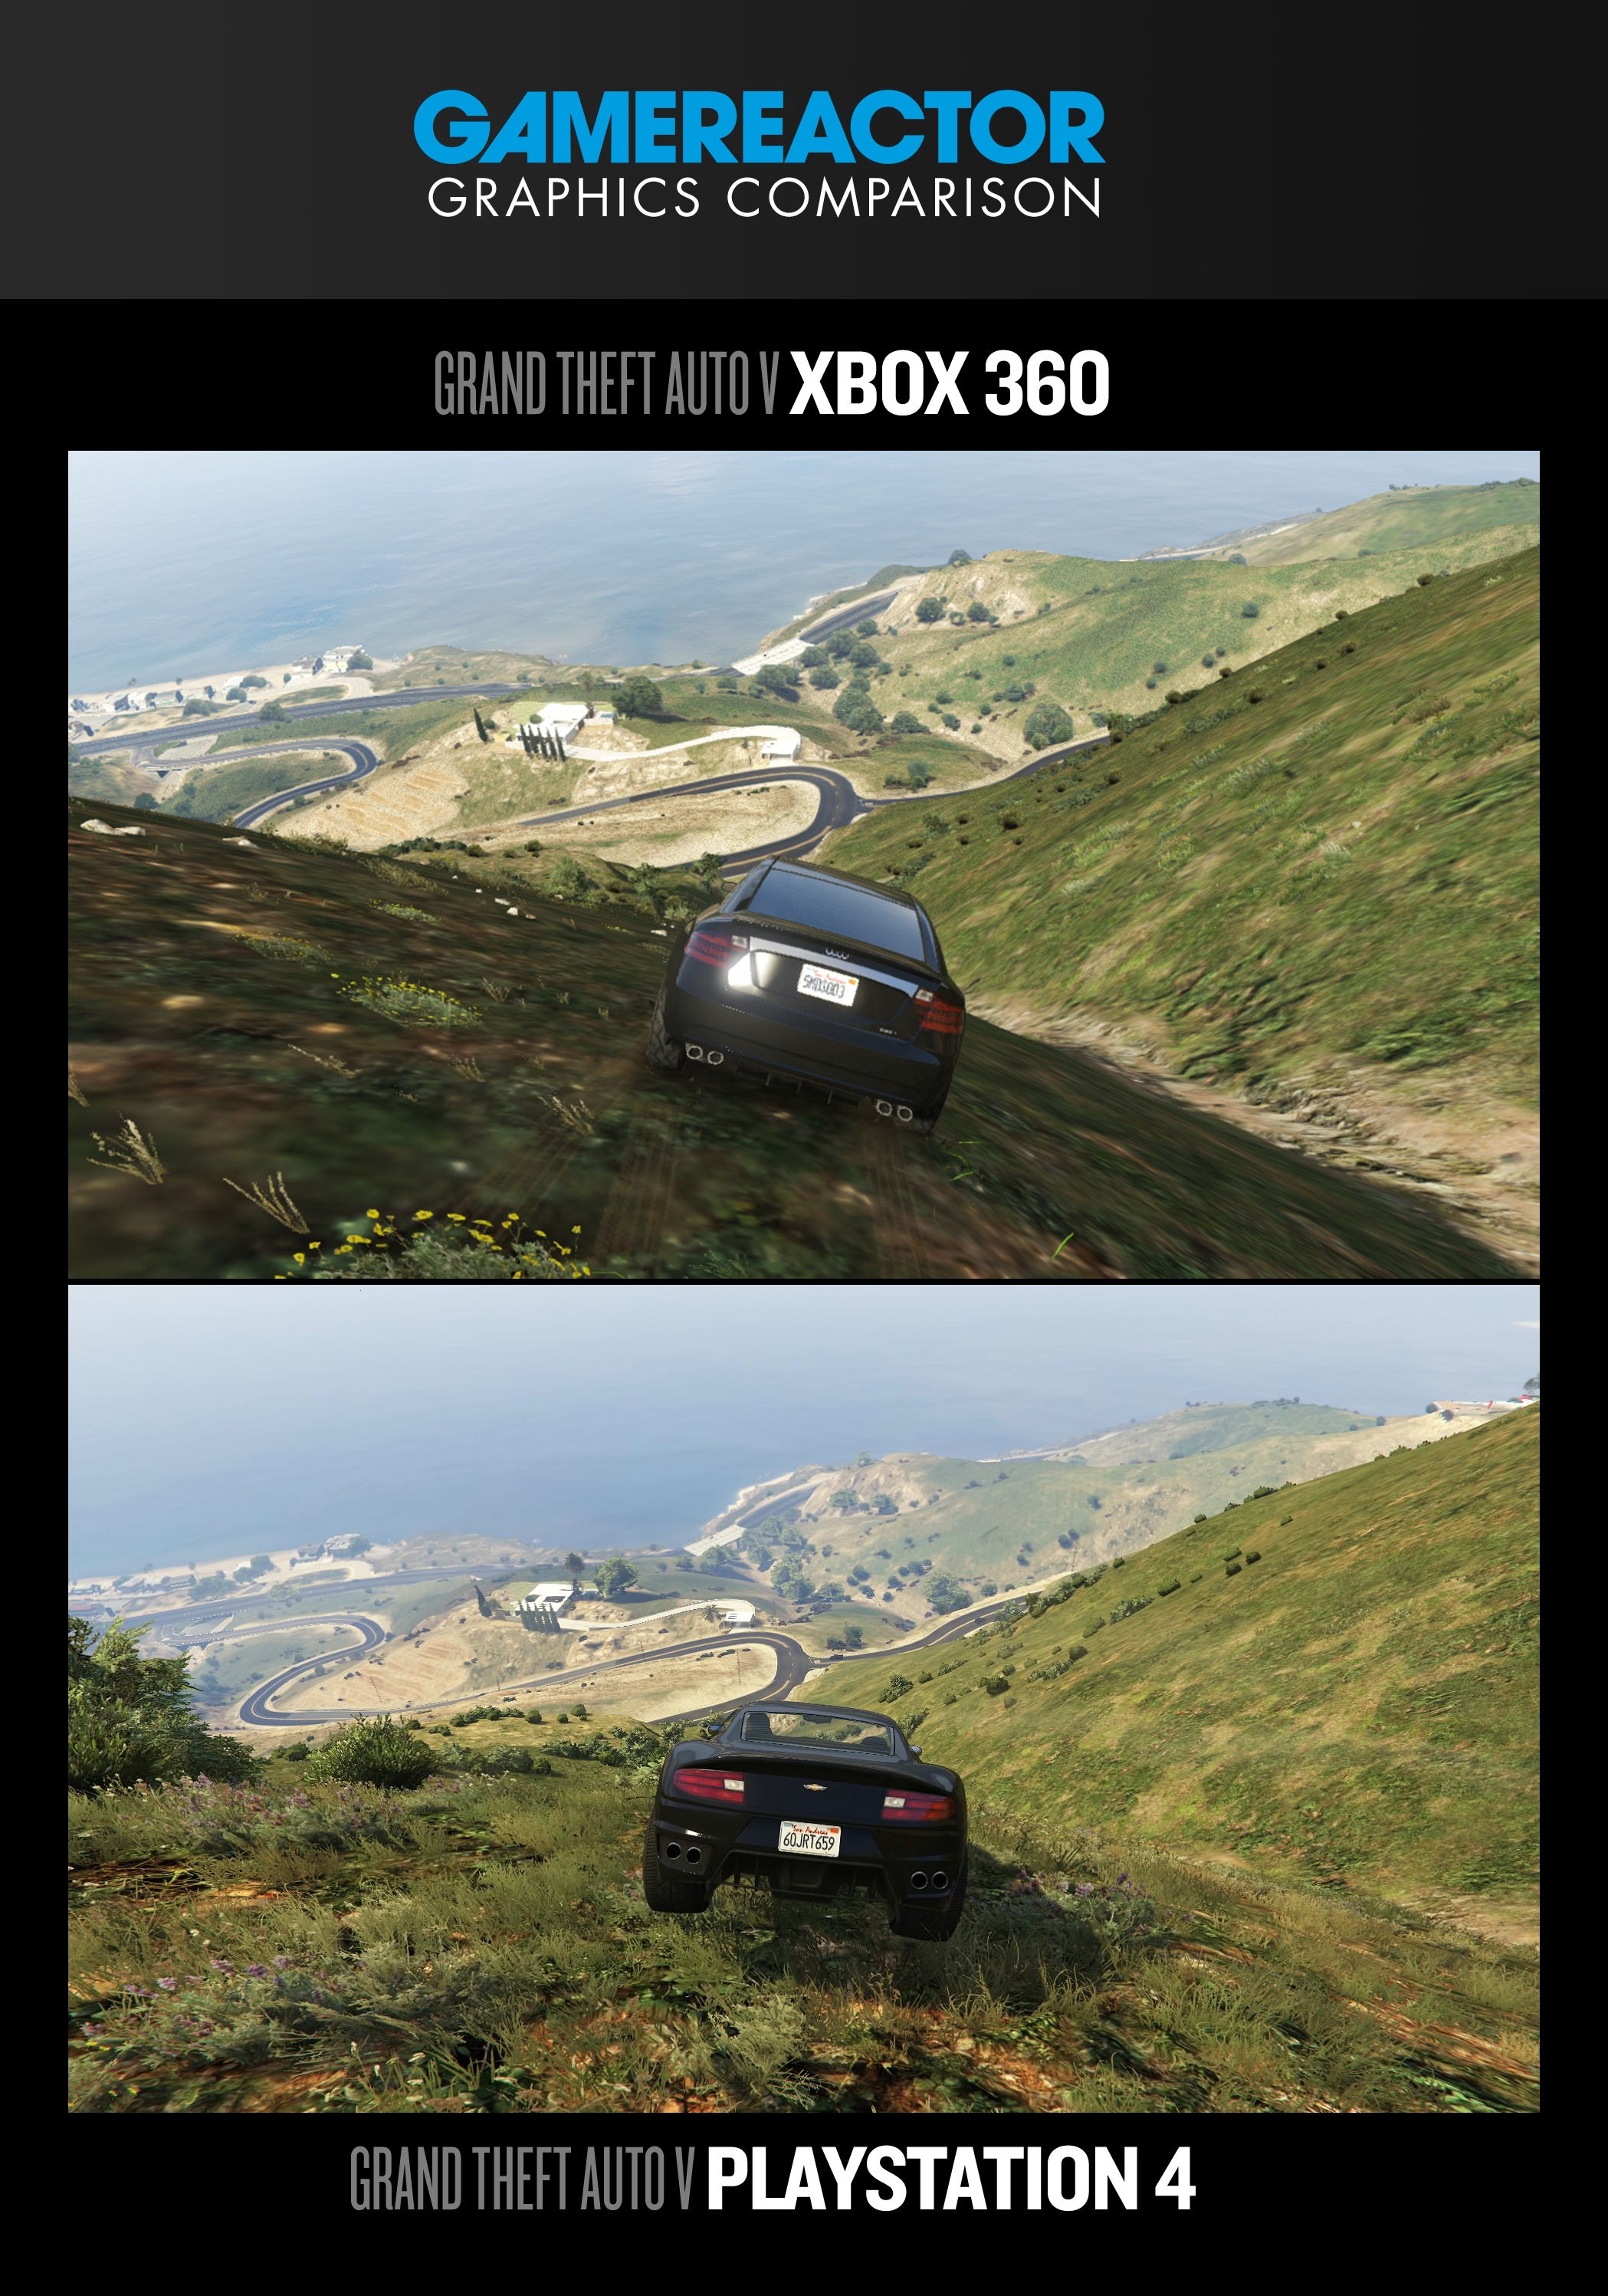 Grand Theft Auto V [Archivo] - Página 8 - Comunidad N3D